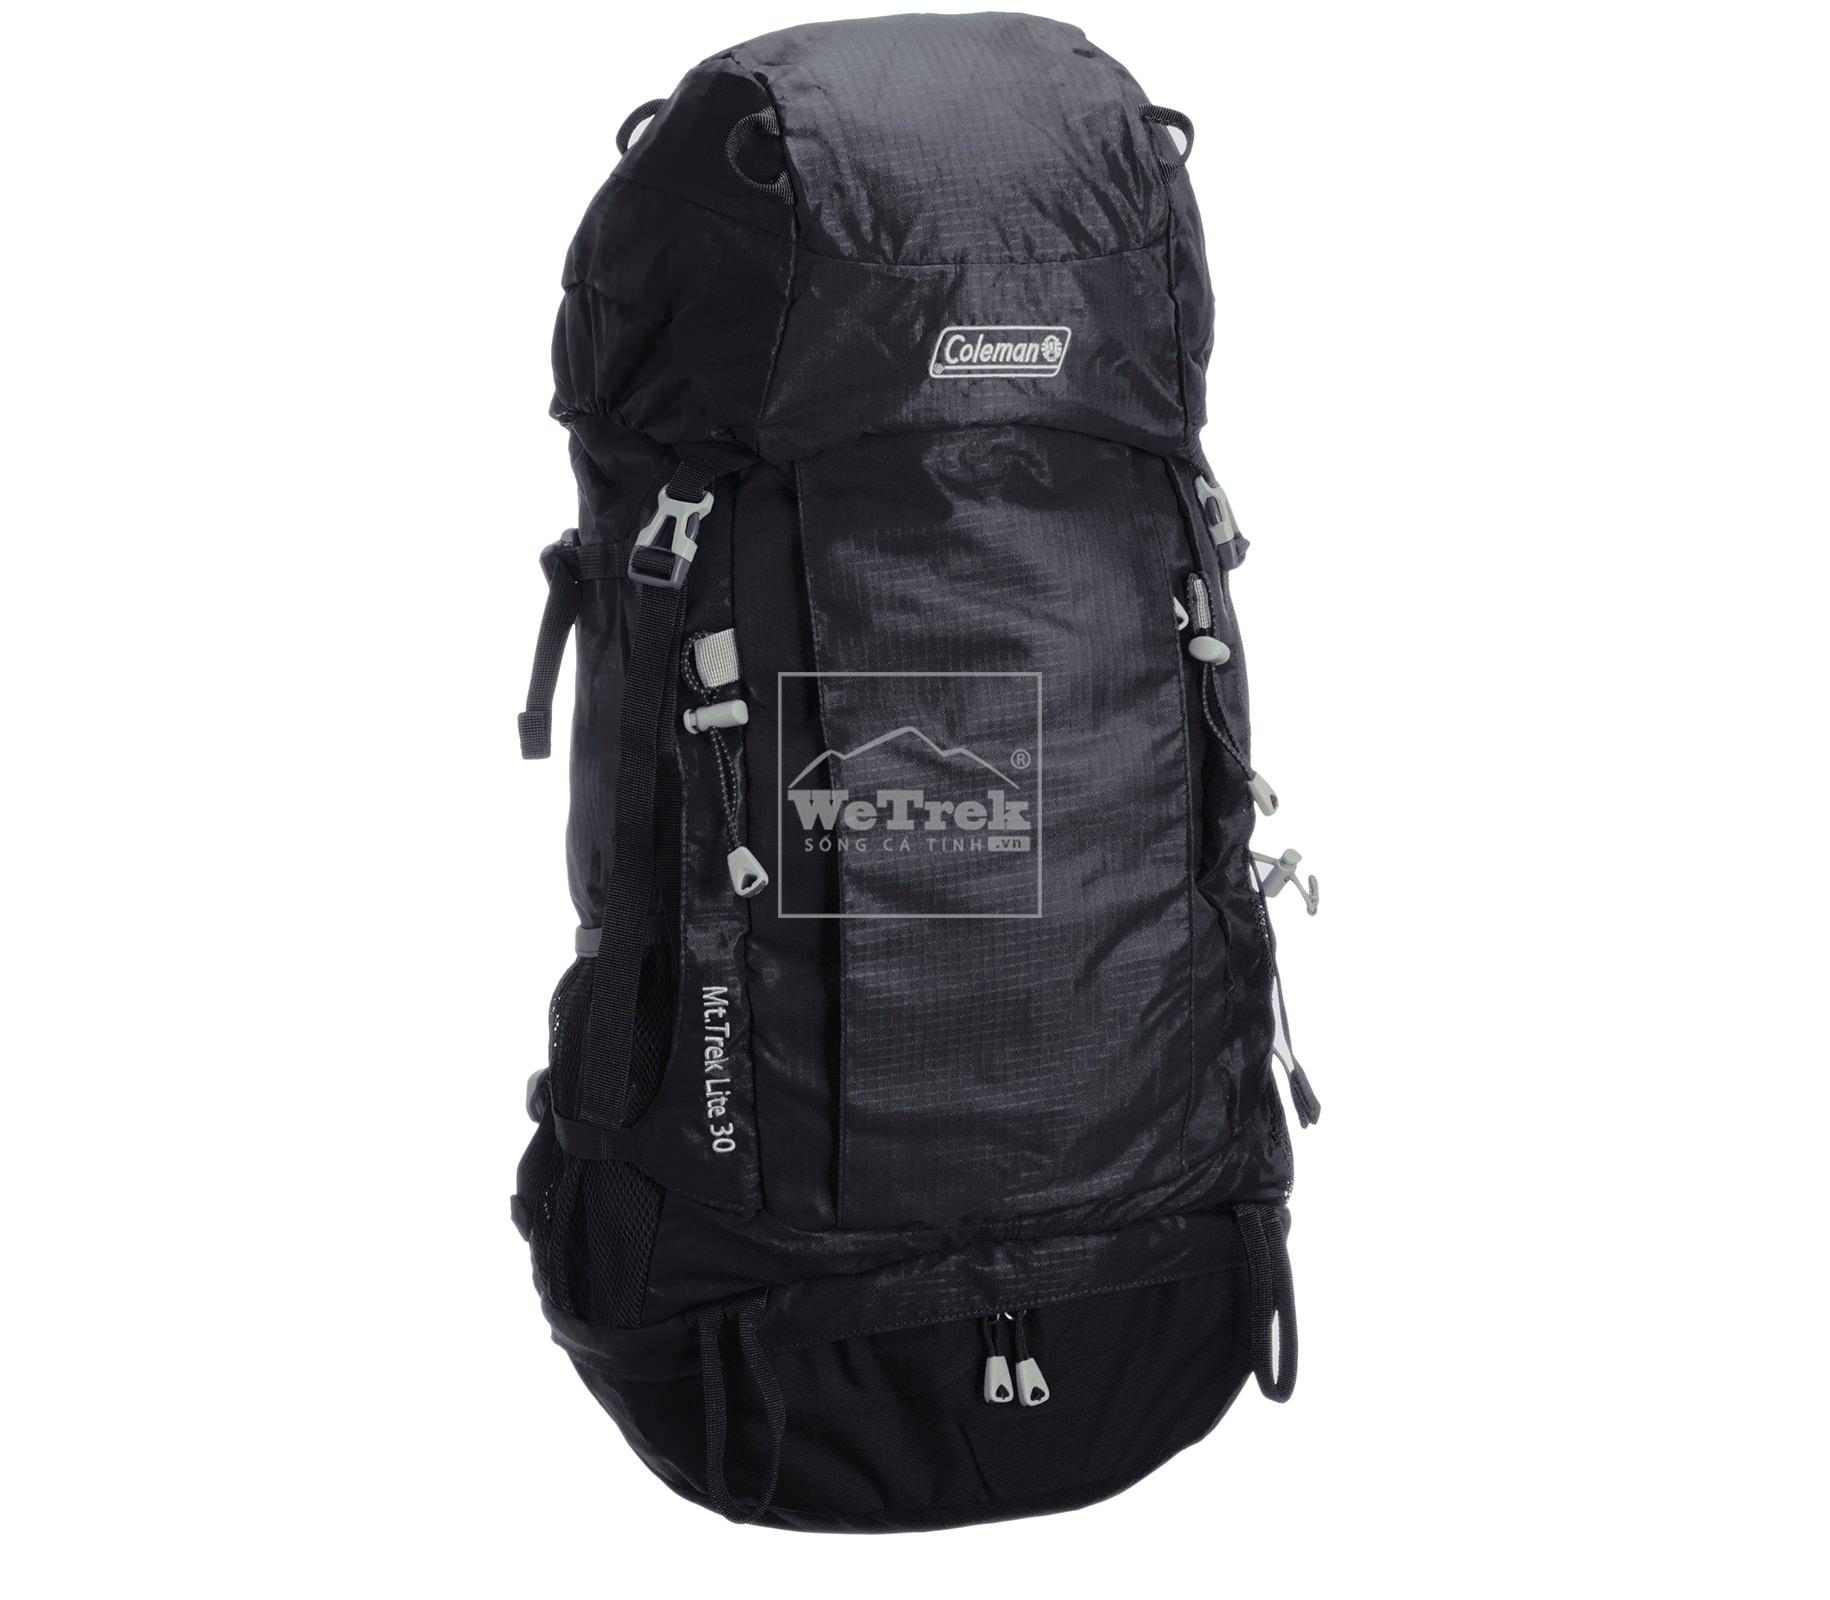 Ba lô leo núi 30L Coleman Mt. Trek Lite Backpack Black CBB4071BK - 7457